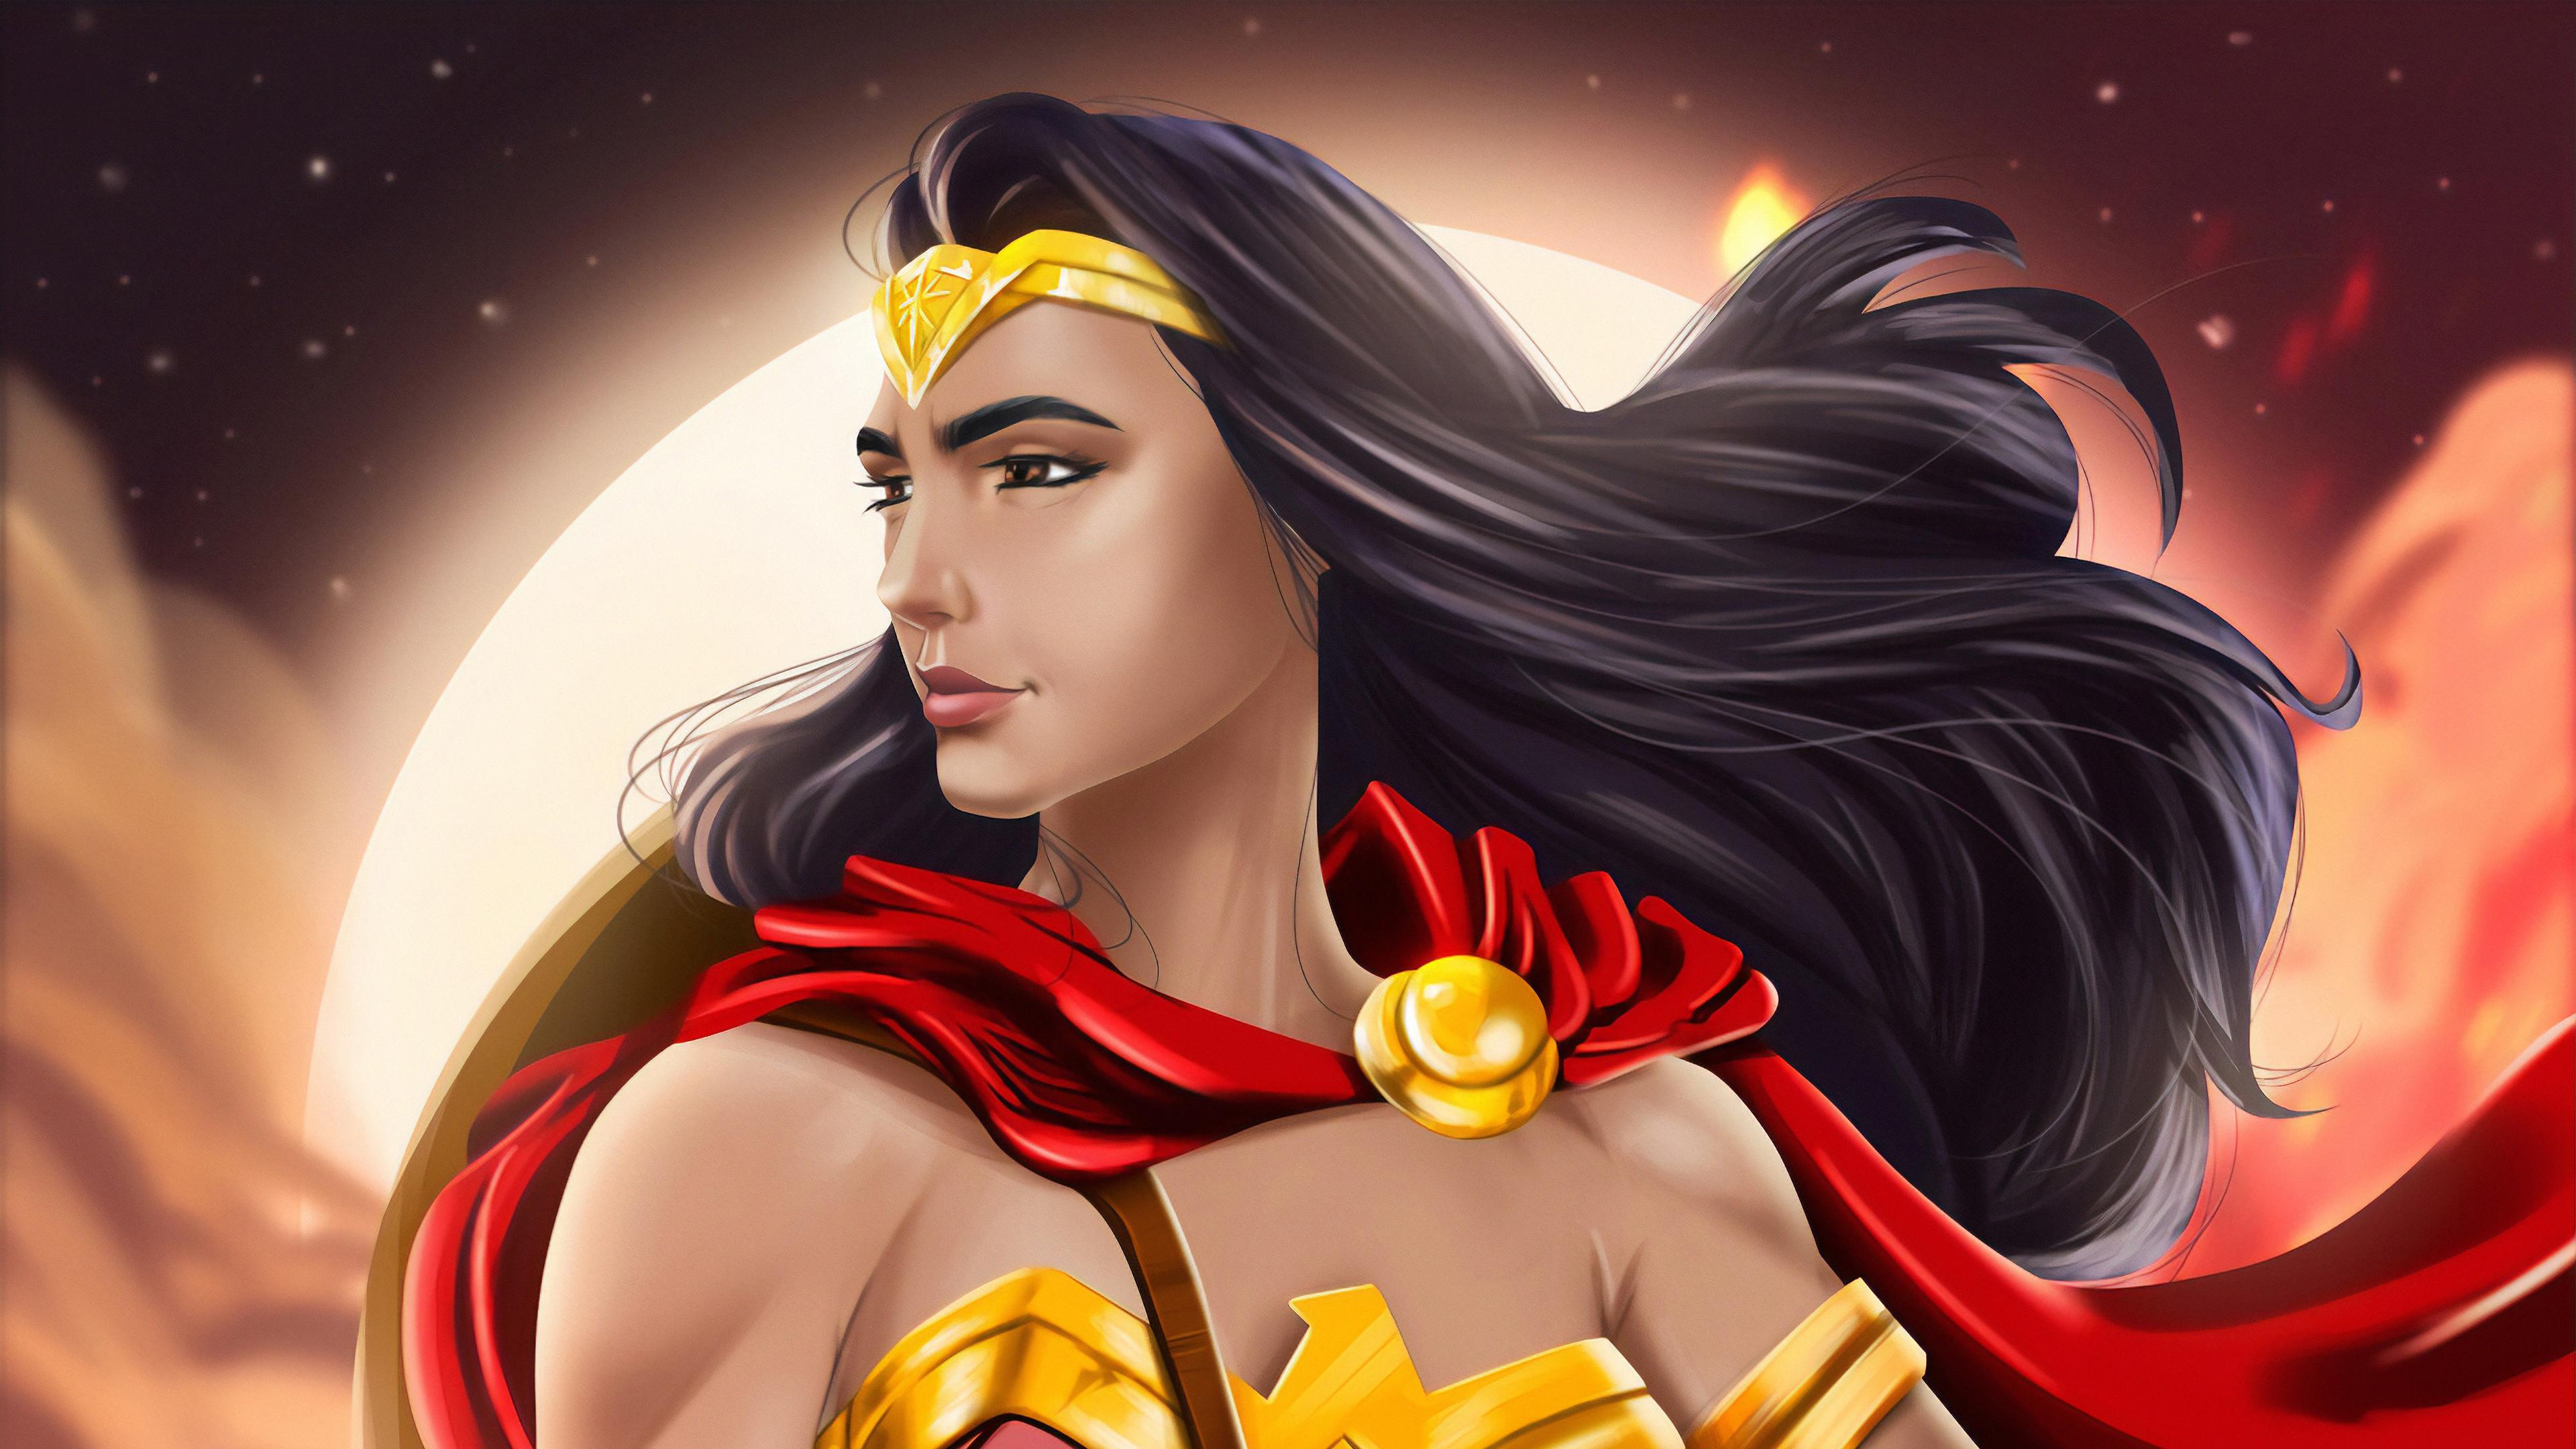 wonderwoman galgadot 1570394548 - Wonderwoman Galgadot - wonder woman wallpapers, superheroes wallpapers, hd-wallpapers, digital art wallpapers, artwork wallpapers, artstation wallpapers, 4k-wallpapers